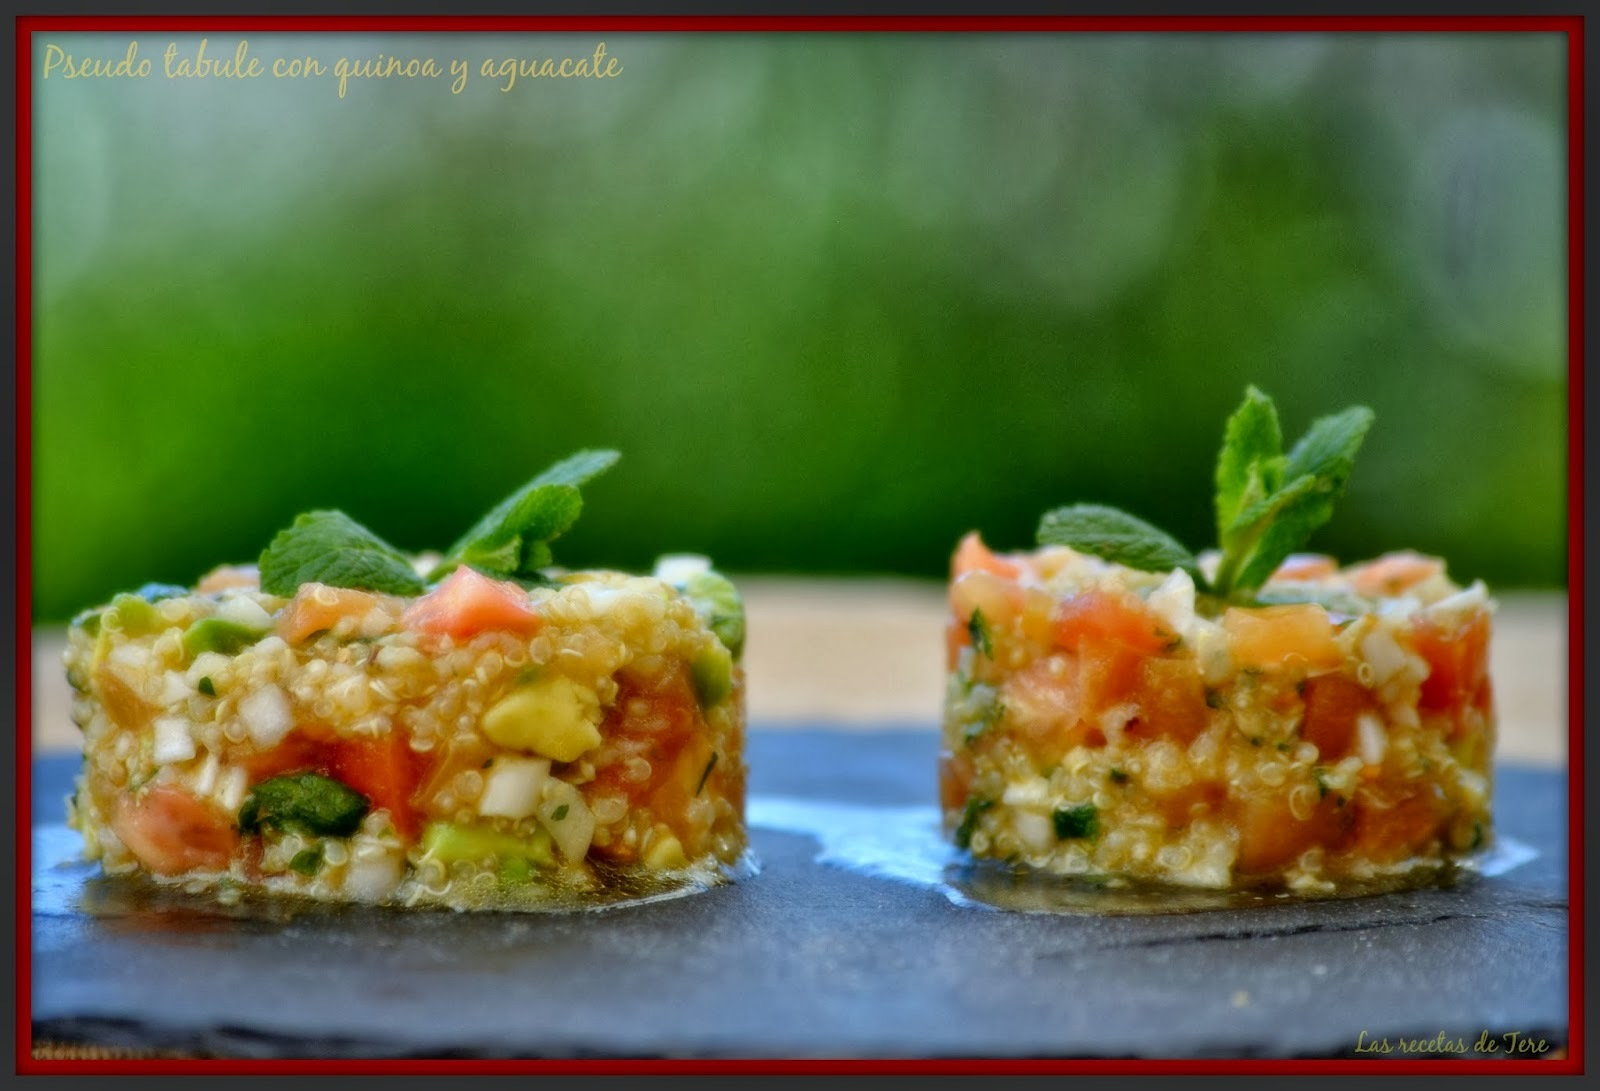 Pseudo tabule con quinoa y aguacate.